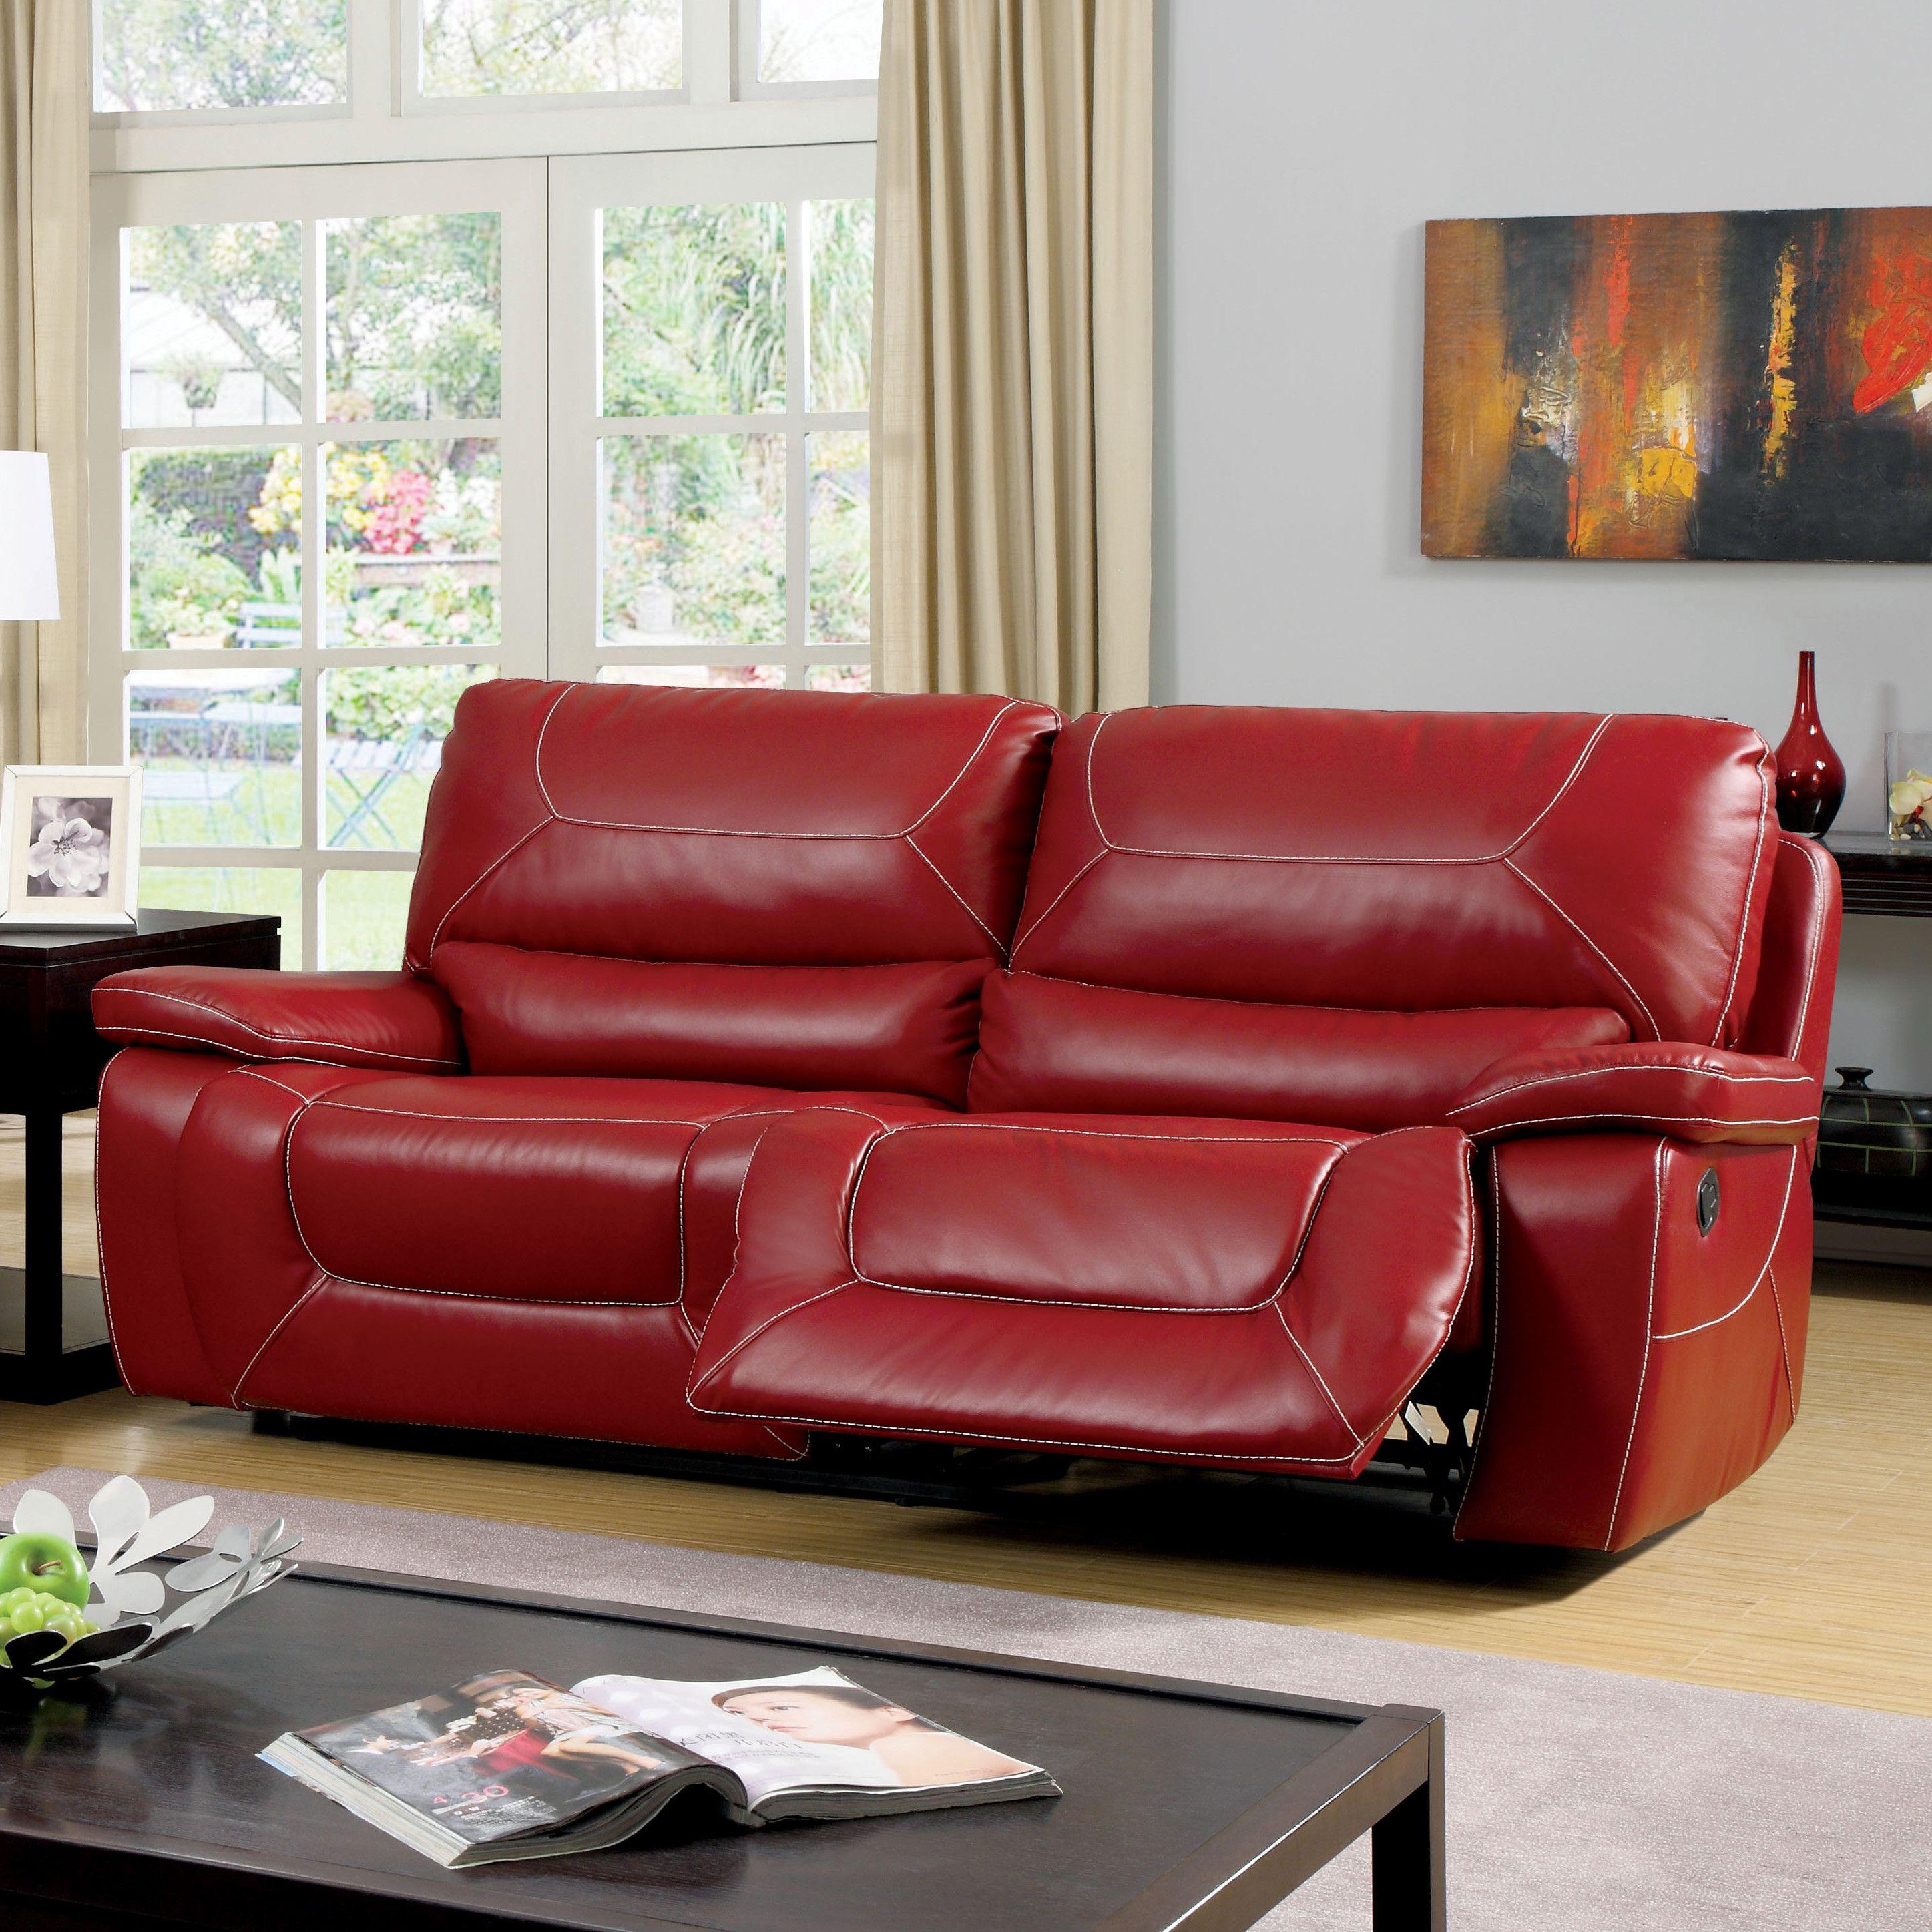 W Schillig 220 Elm 316 Elba sofa Buyer Inspiration